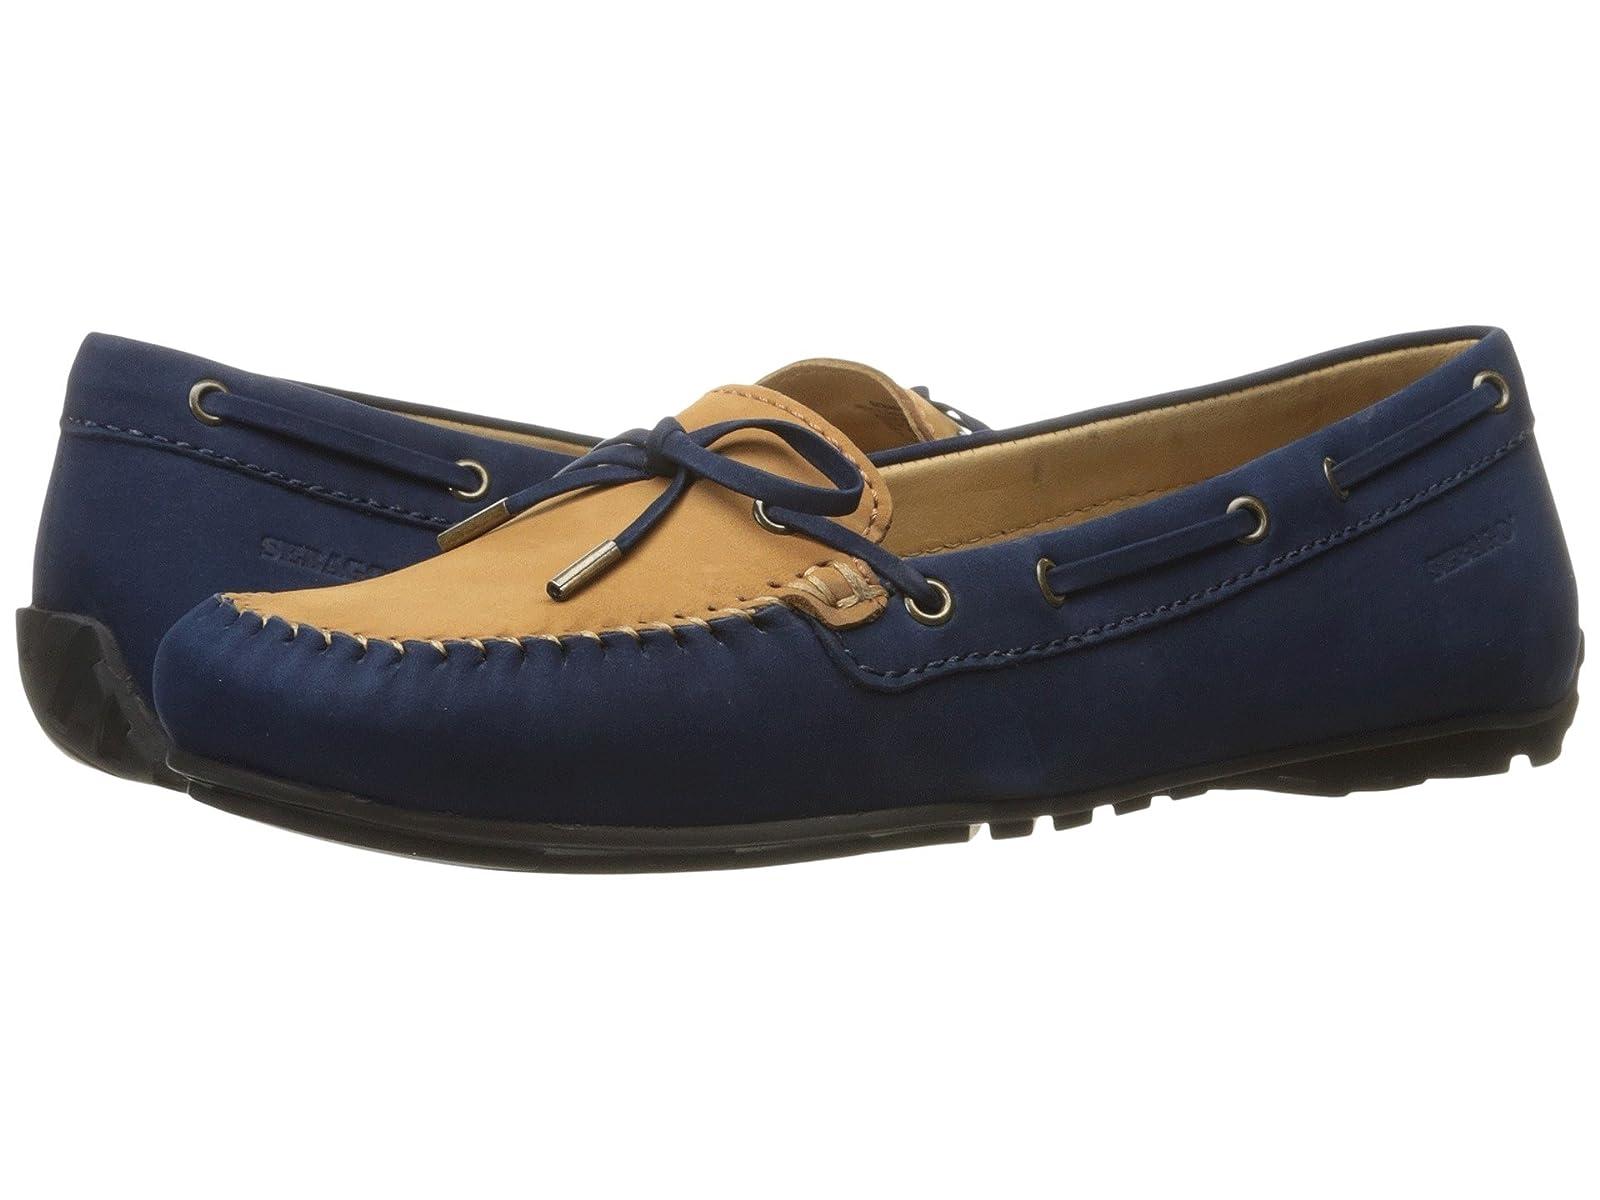 Sebago Harper TieCheap and distinctive eye-catching shoes